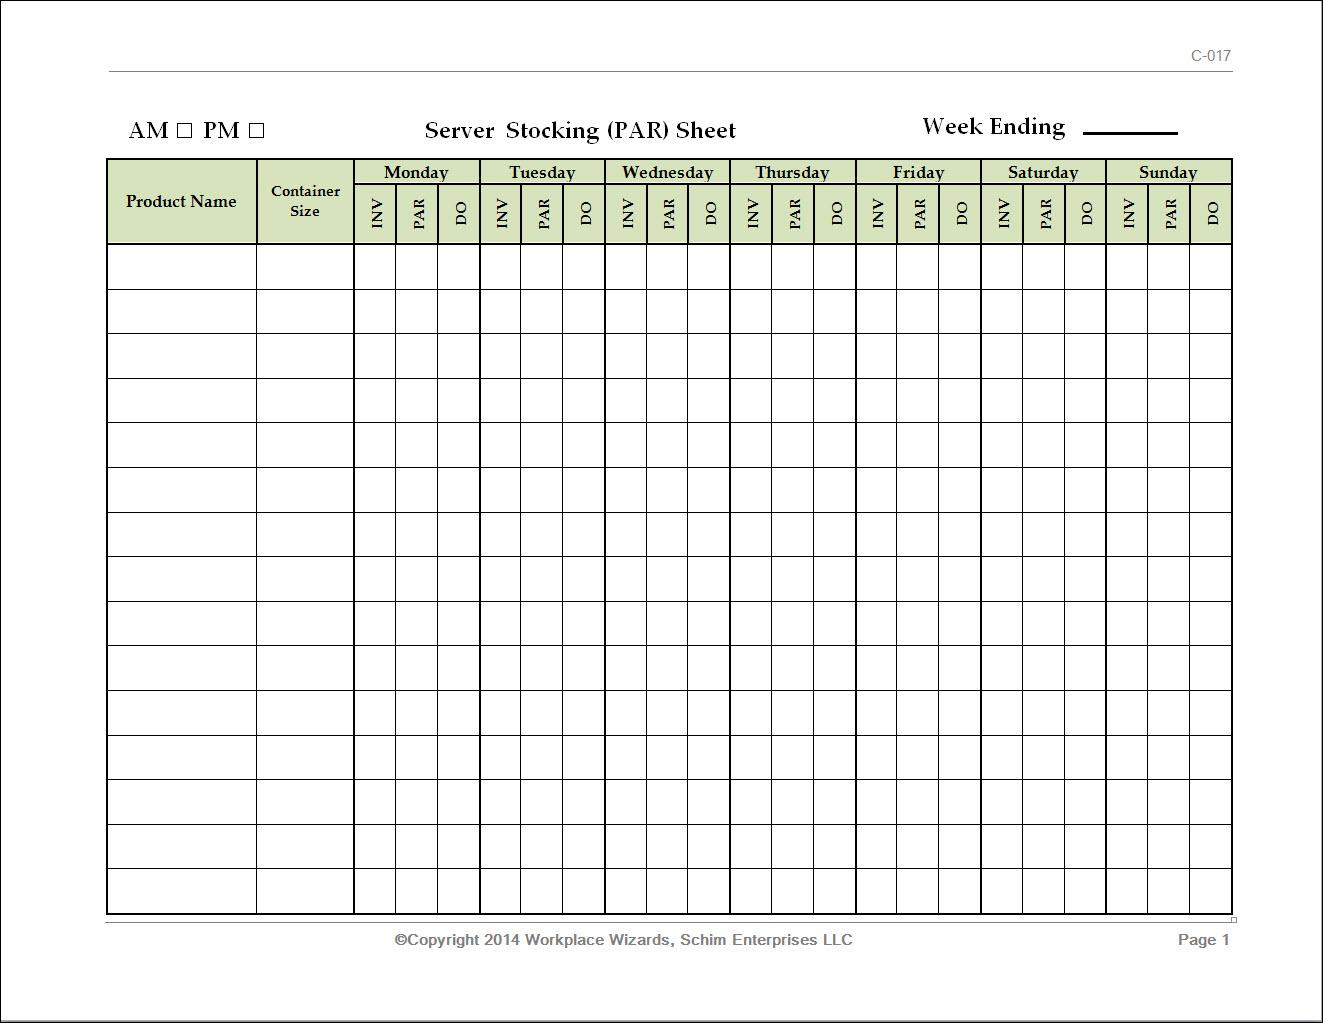 Restaurant Server Stocking Par Sheet